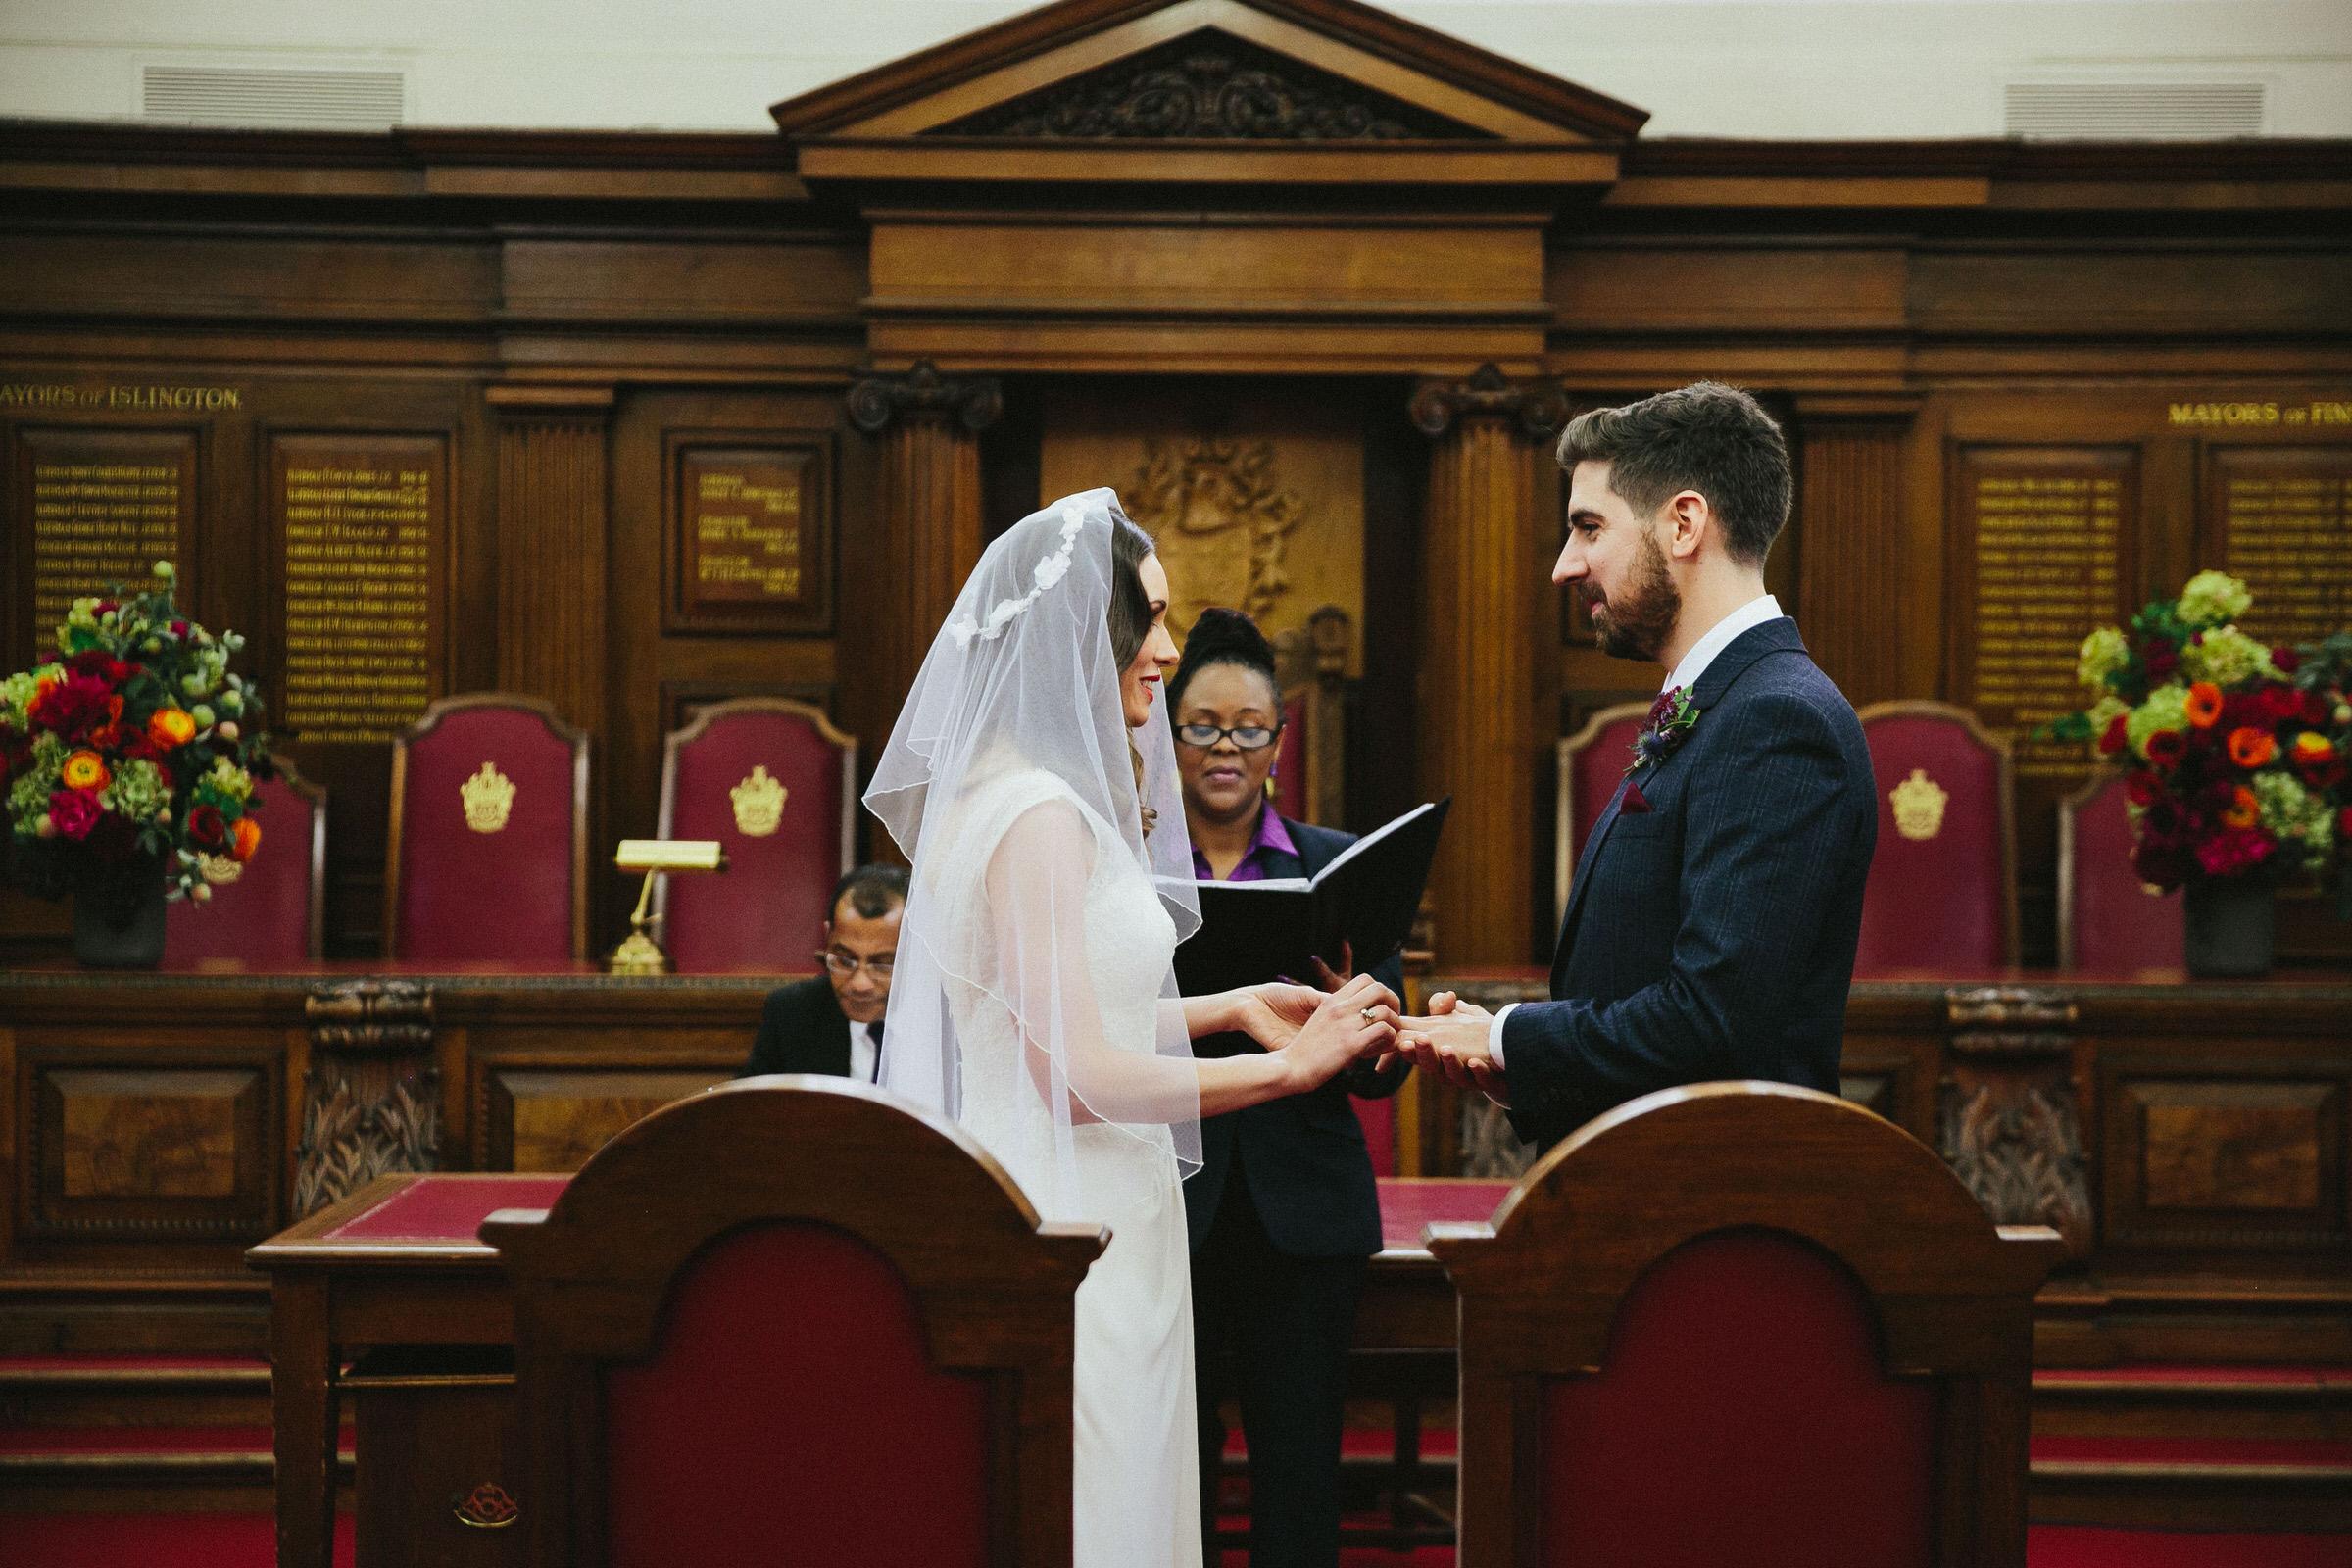 Islington Town Hall ceremony